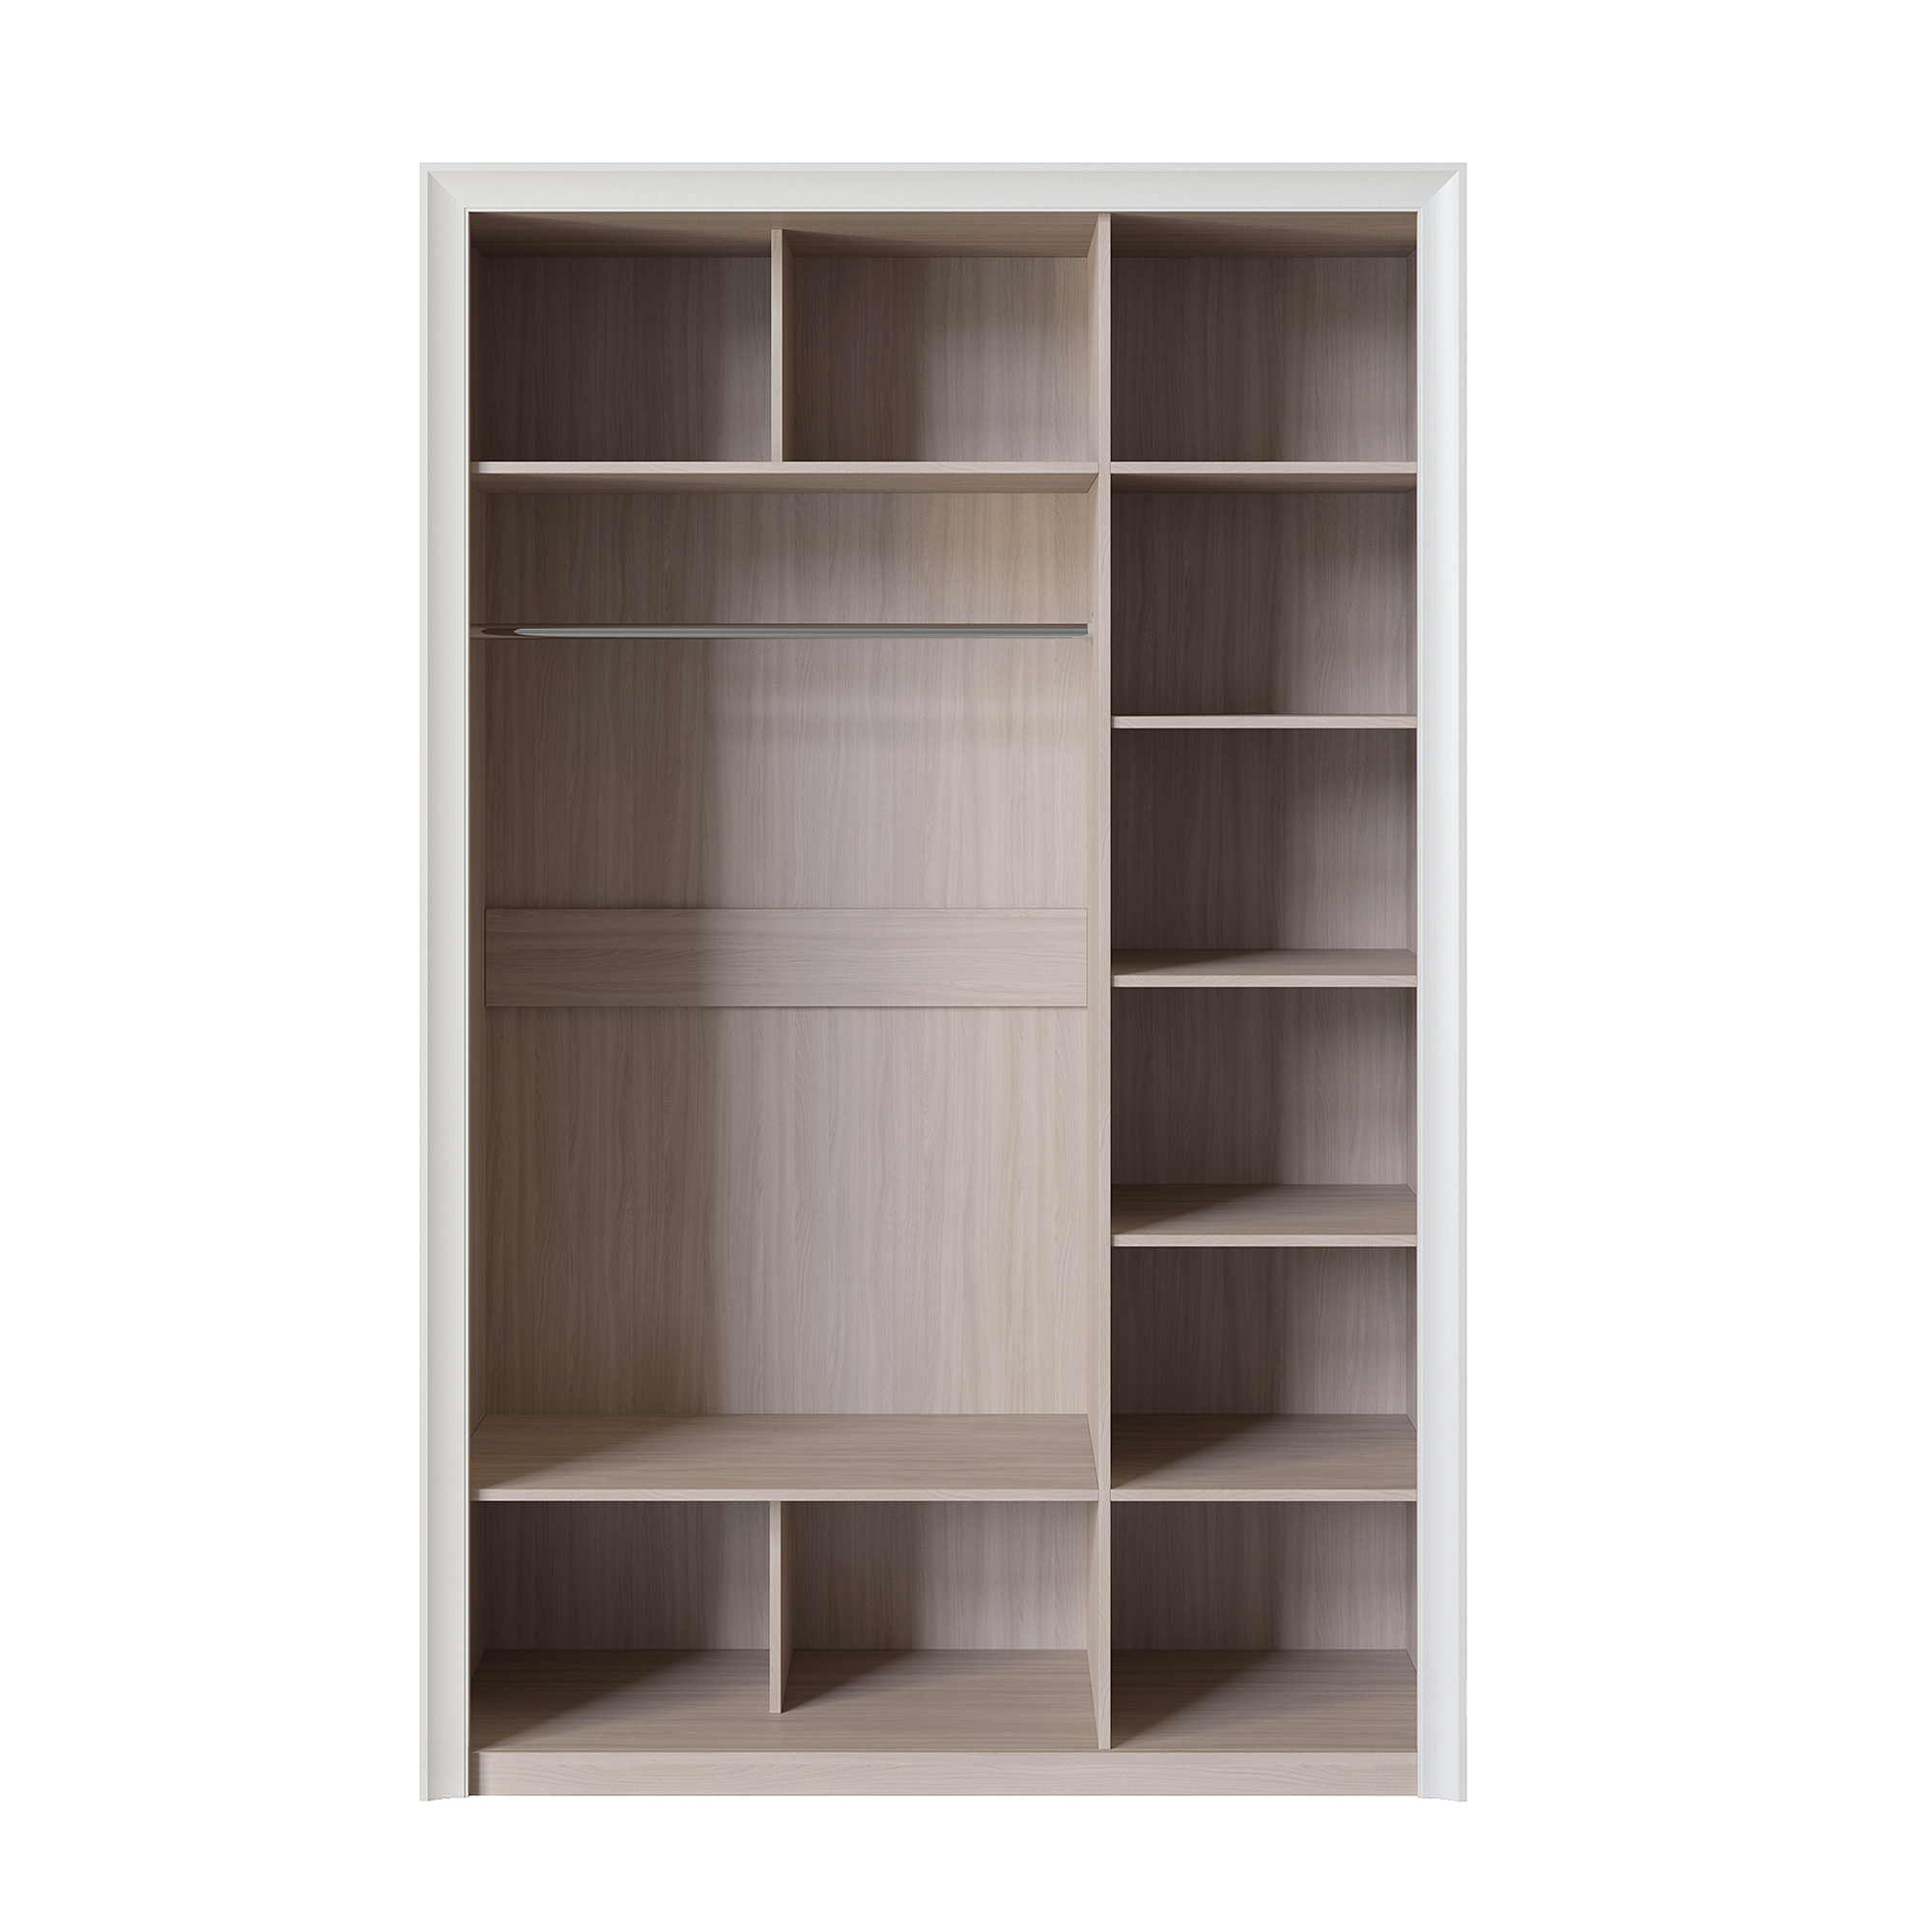 Шкаф трёхдверный (корпус) «Прато» Кураж